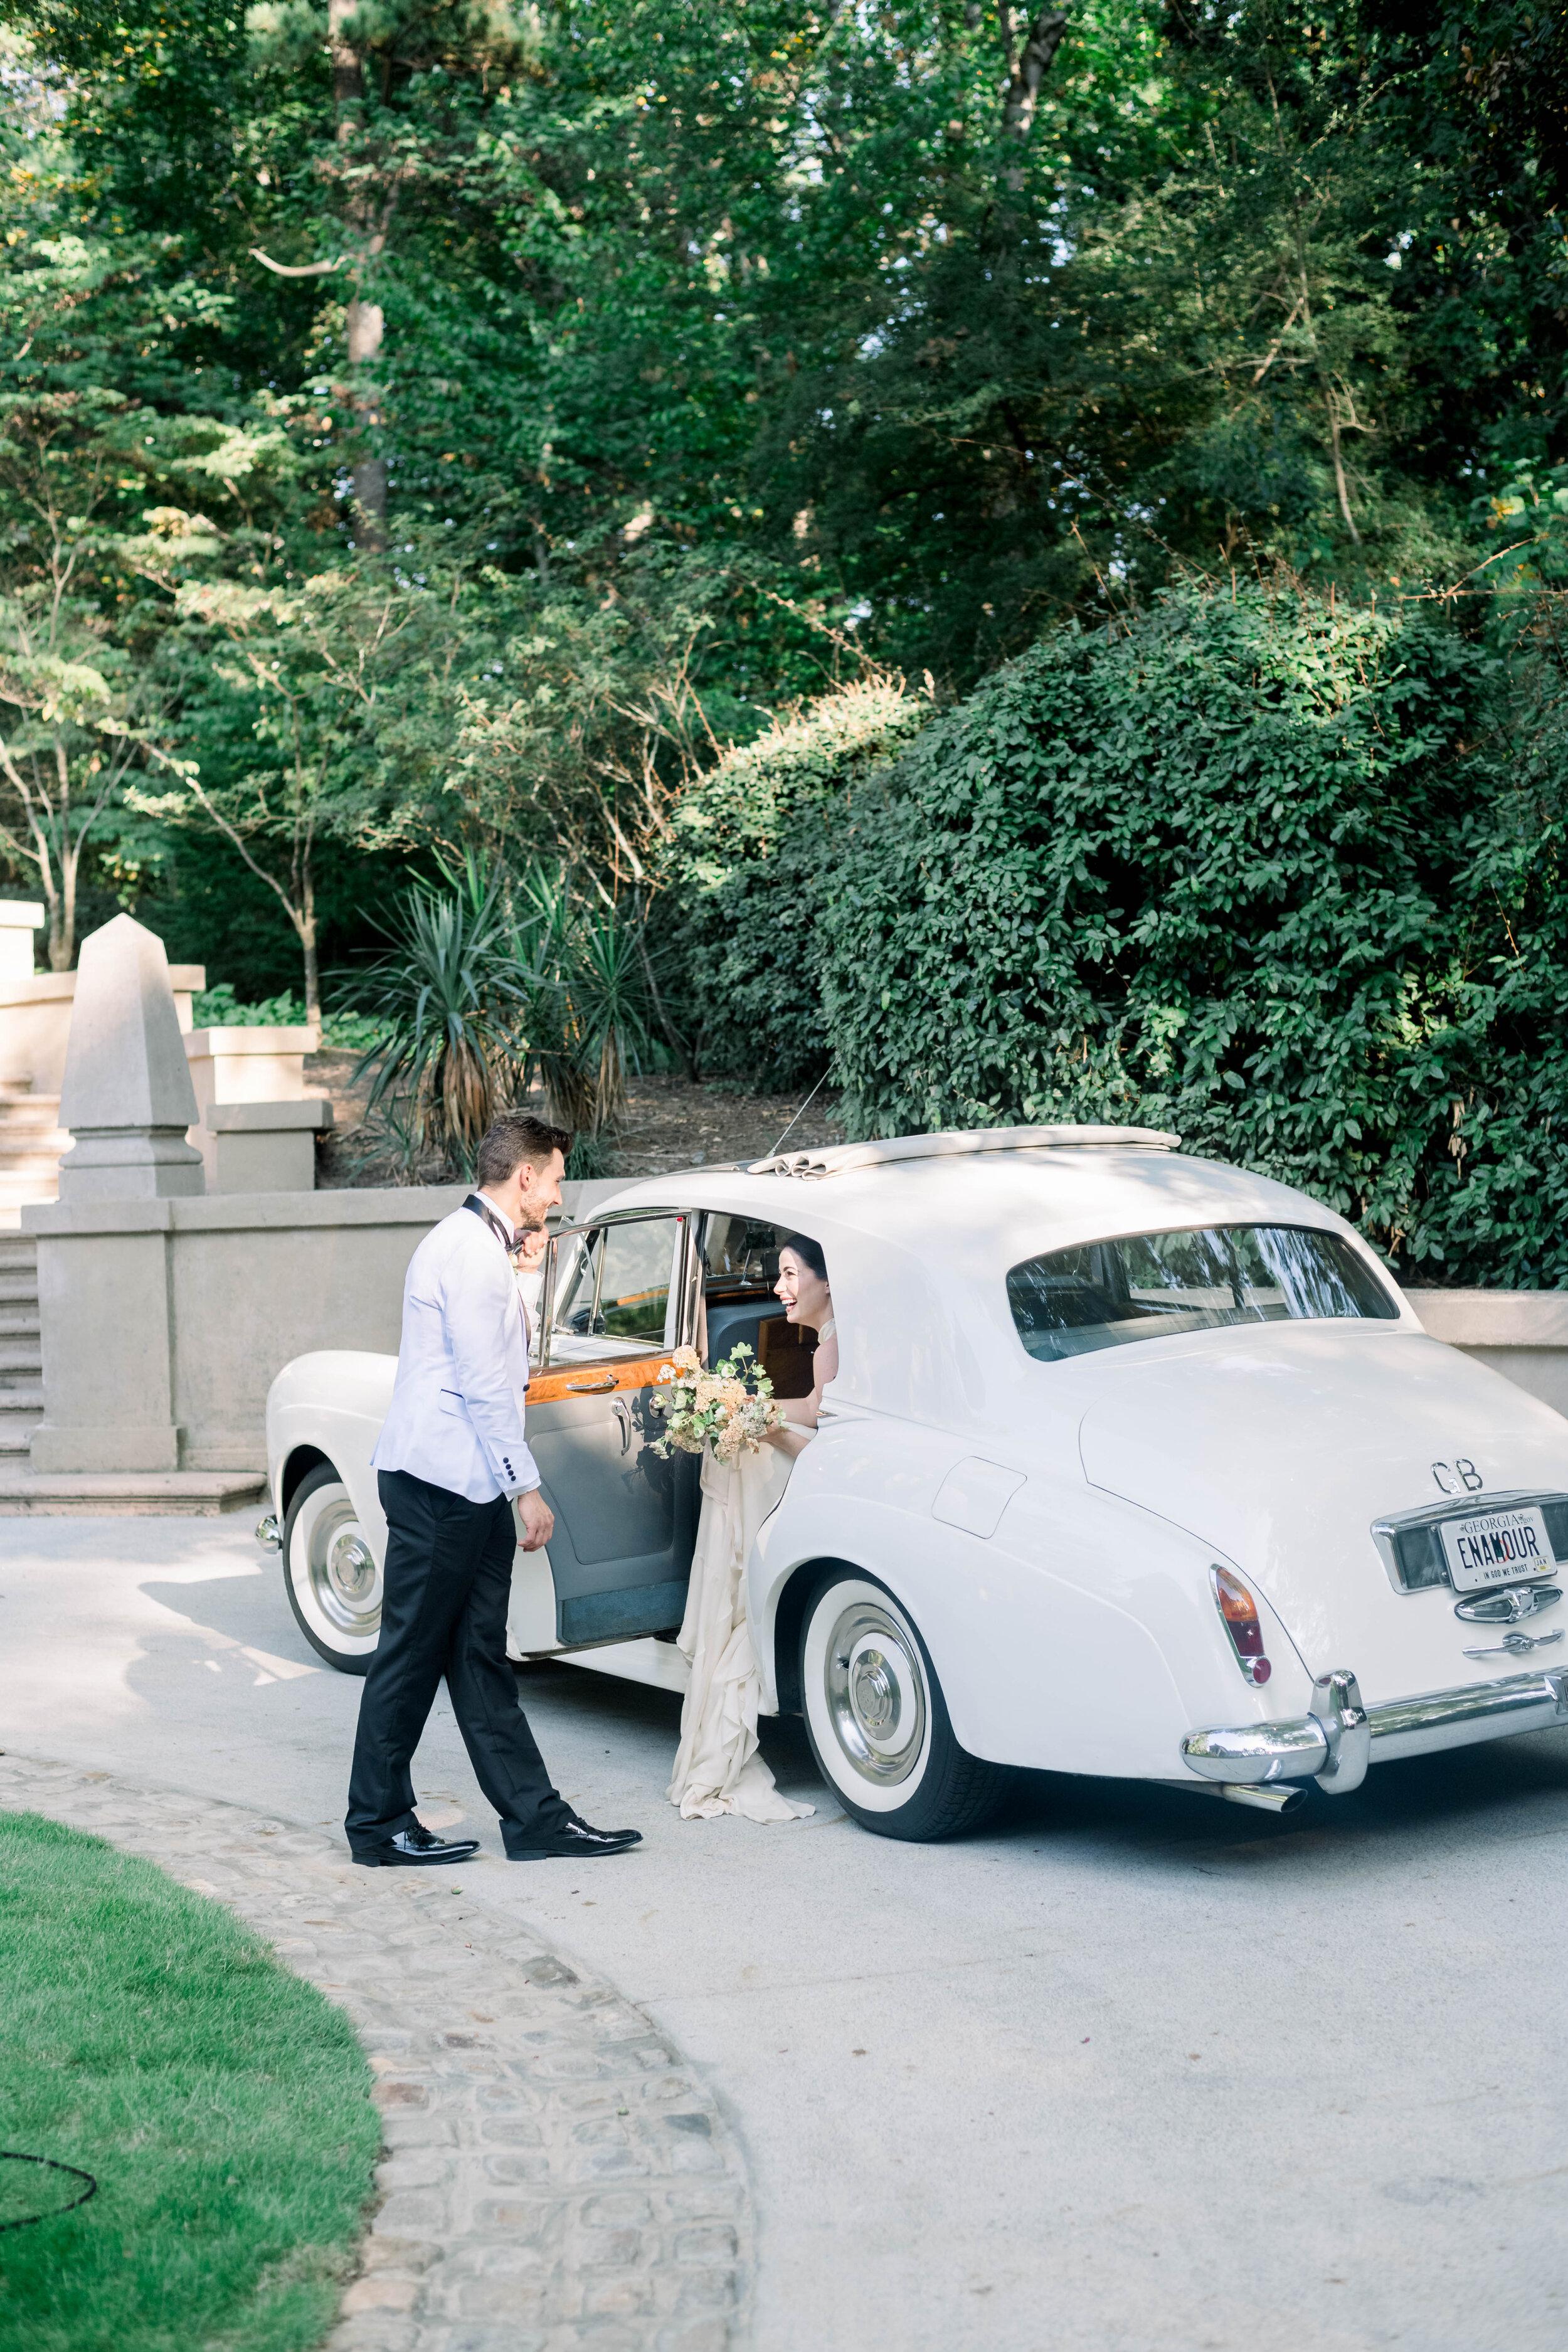 fine art wedding, Atlanta wedding, swan house wedding, modern wedding, rolls Royce wedding, swan house, high neck wedding dress, white tux, vintage car, wedding car